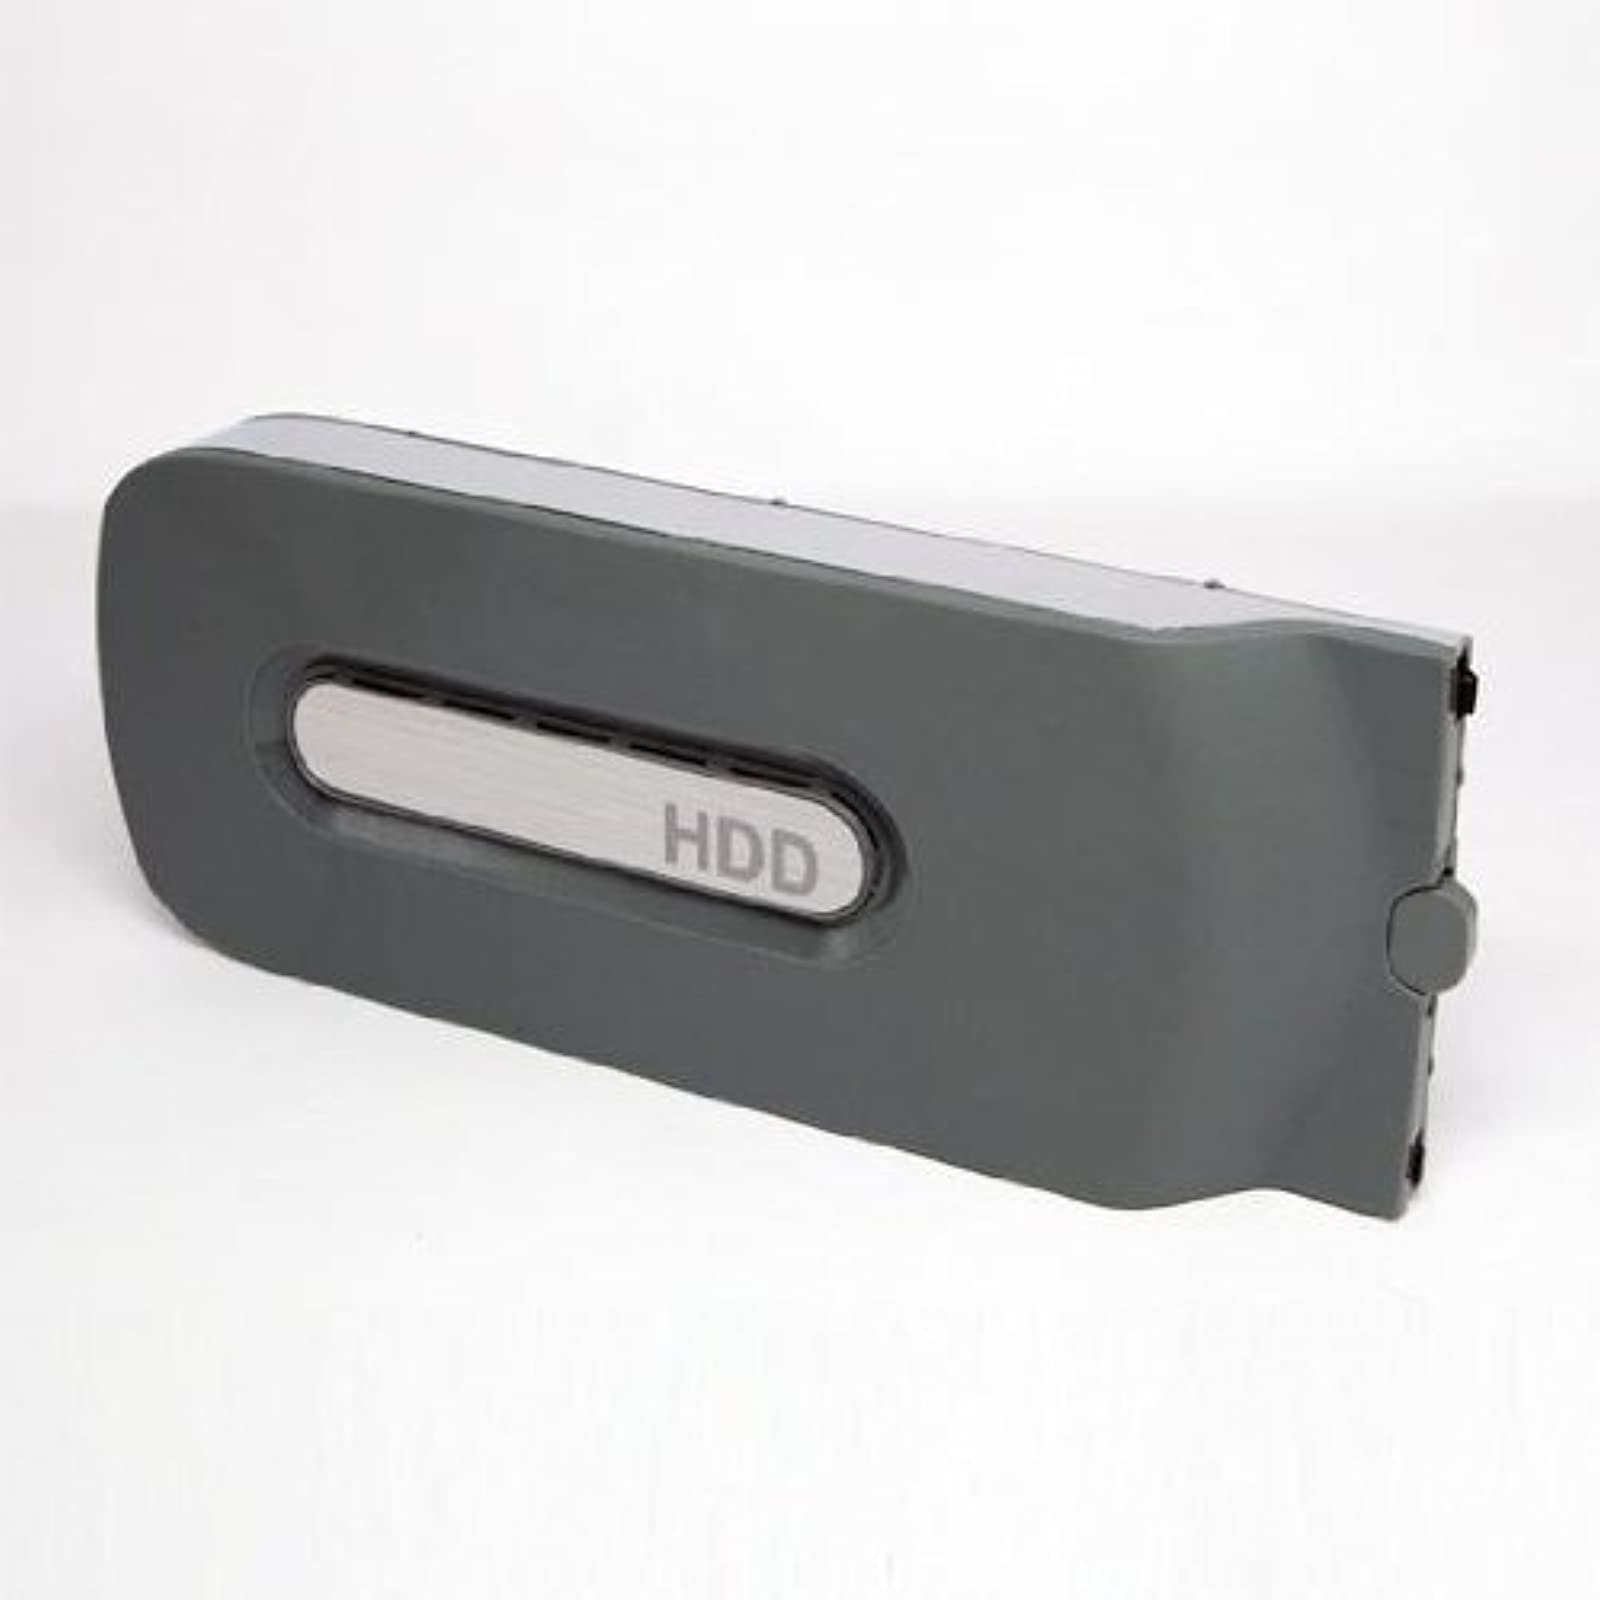 120GB Hard Disk Drive Hdd For Microsoft Xbox 360